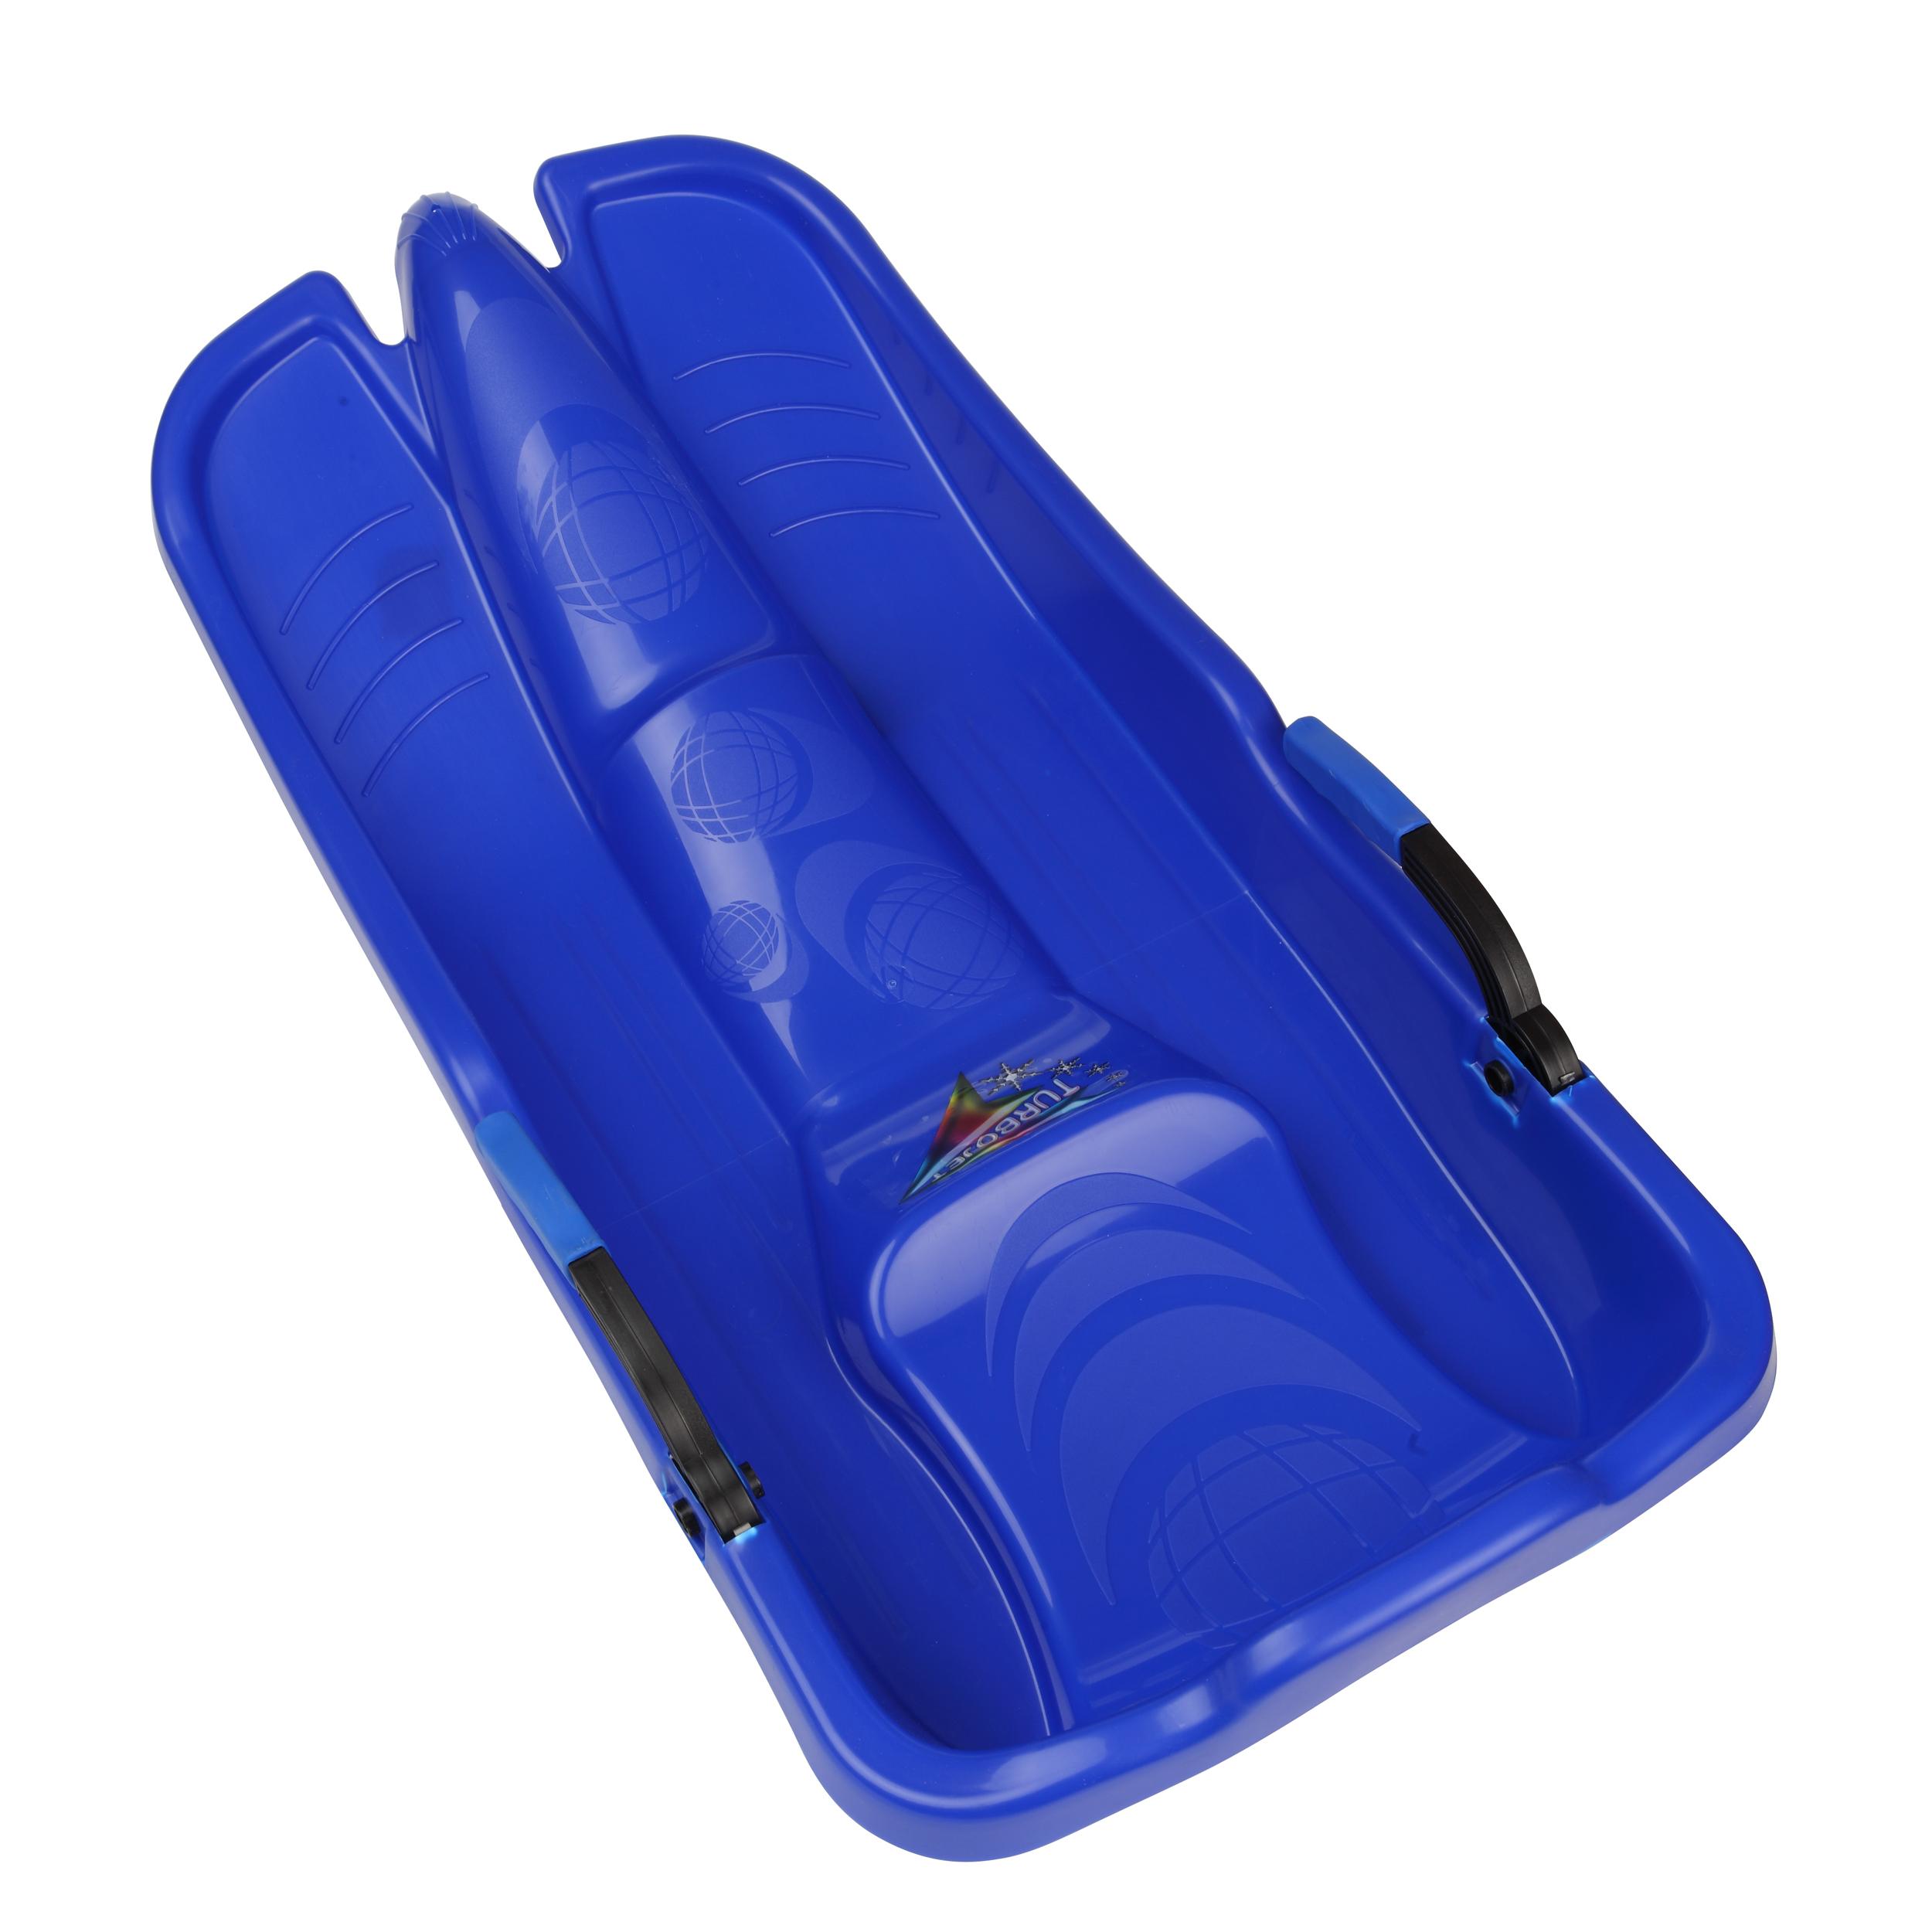 TurboJet 34-Inch Snow Sledge with Handles and Raised Backrest by Plastkon Blue by Plastkon